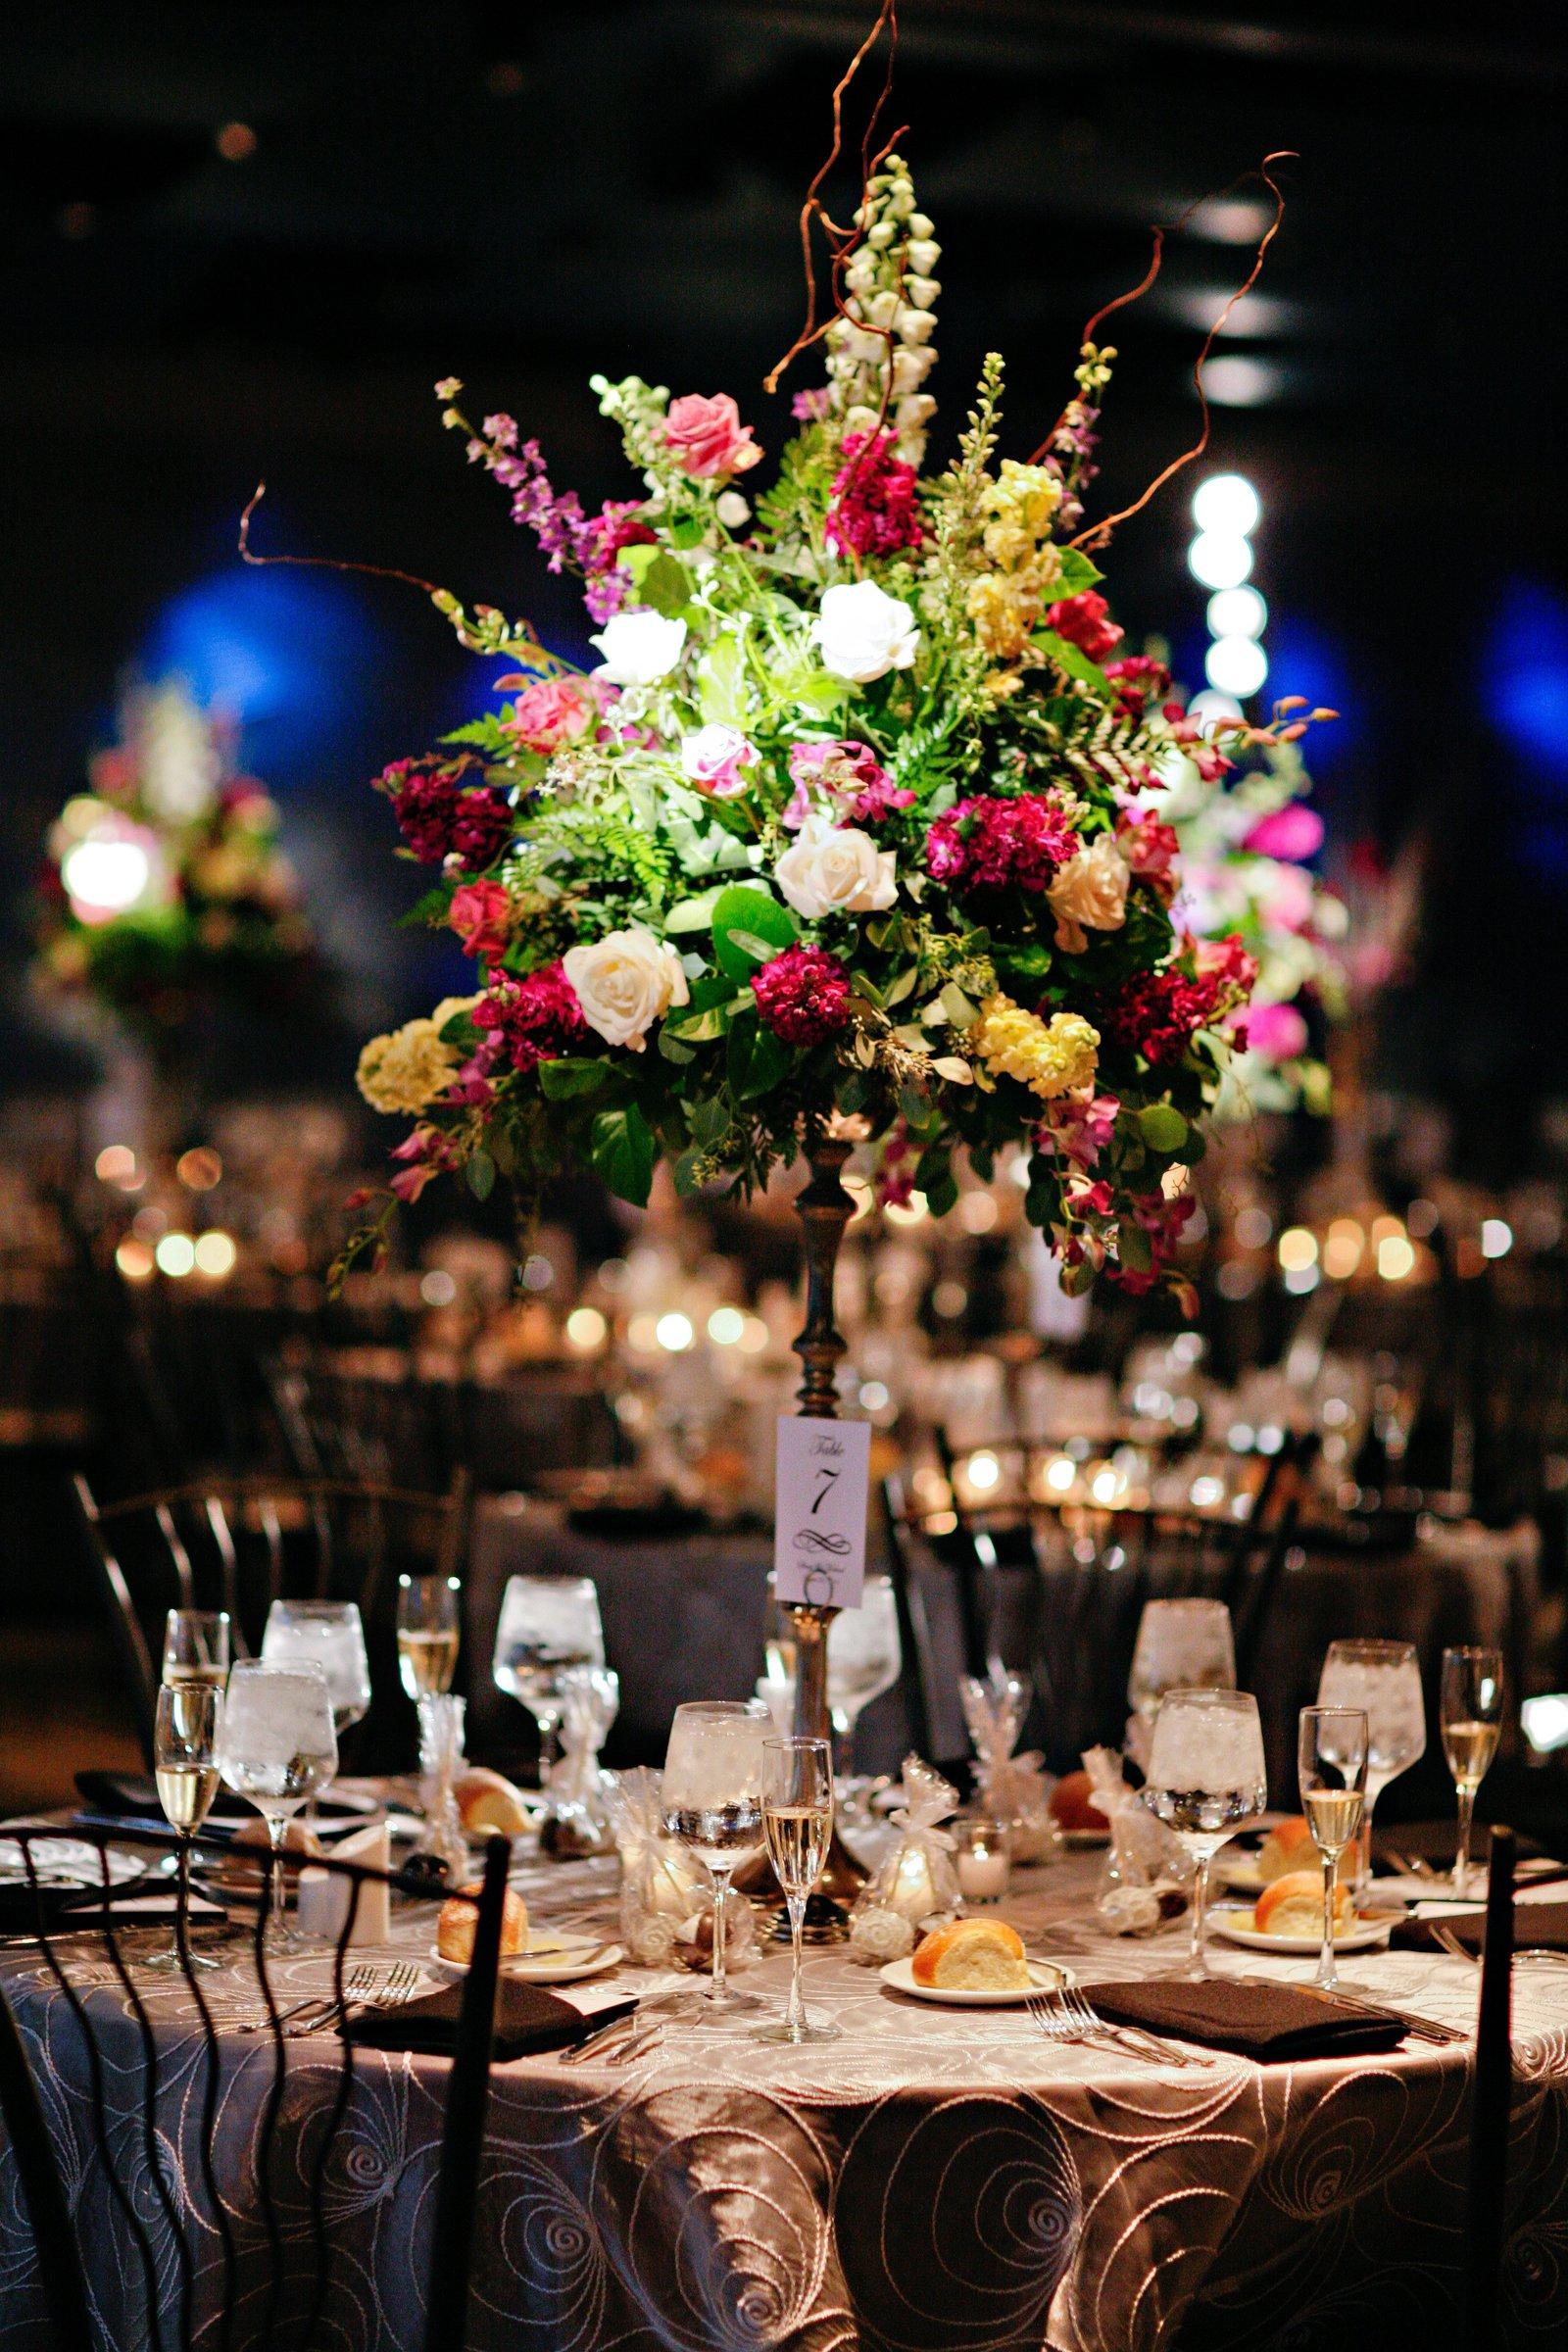 Eventricity Floral Design of centerpiece for adventure aquarium wedding reception in new jersey